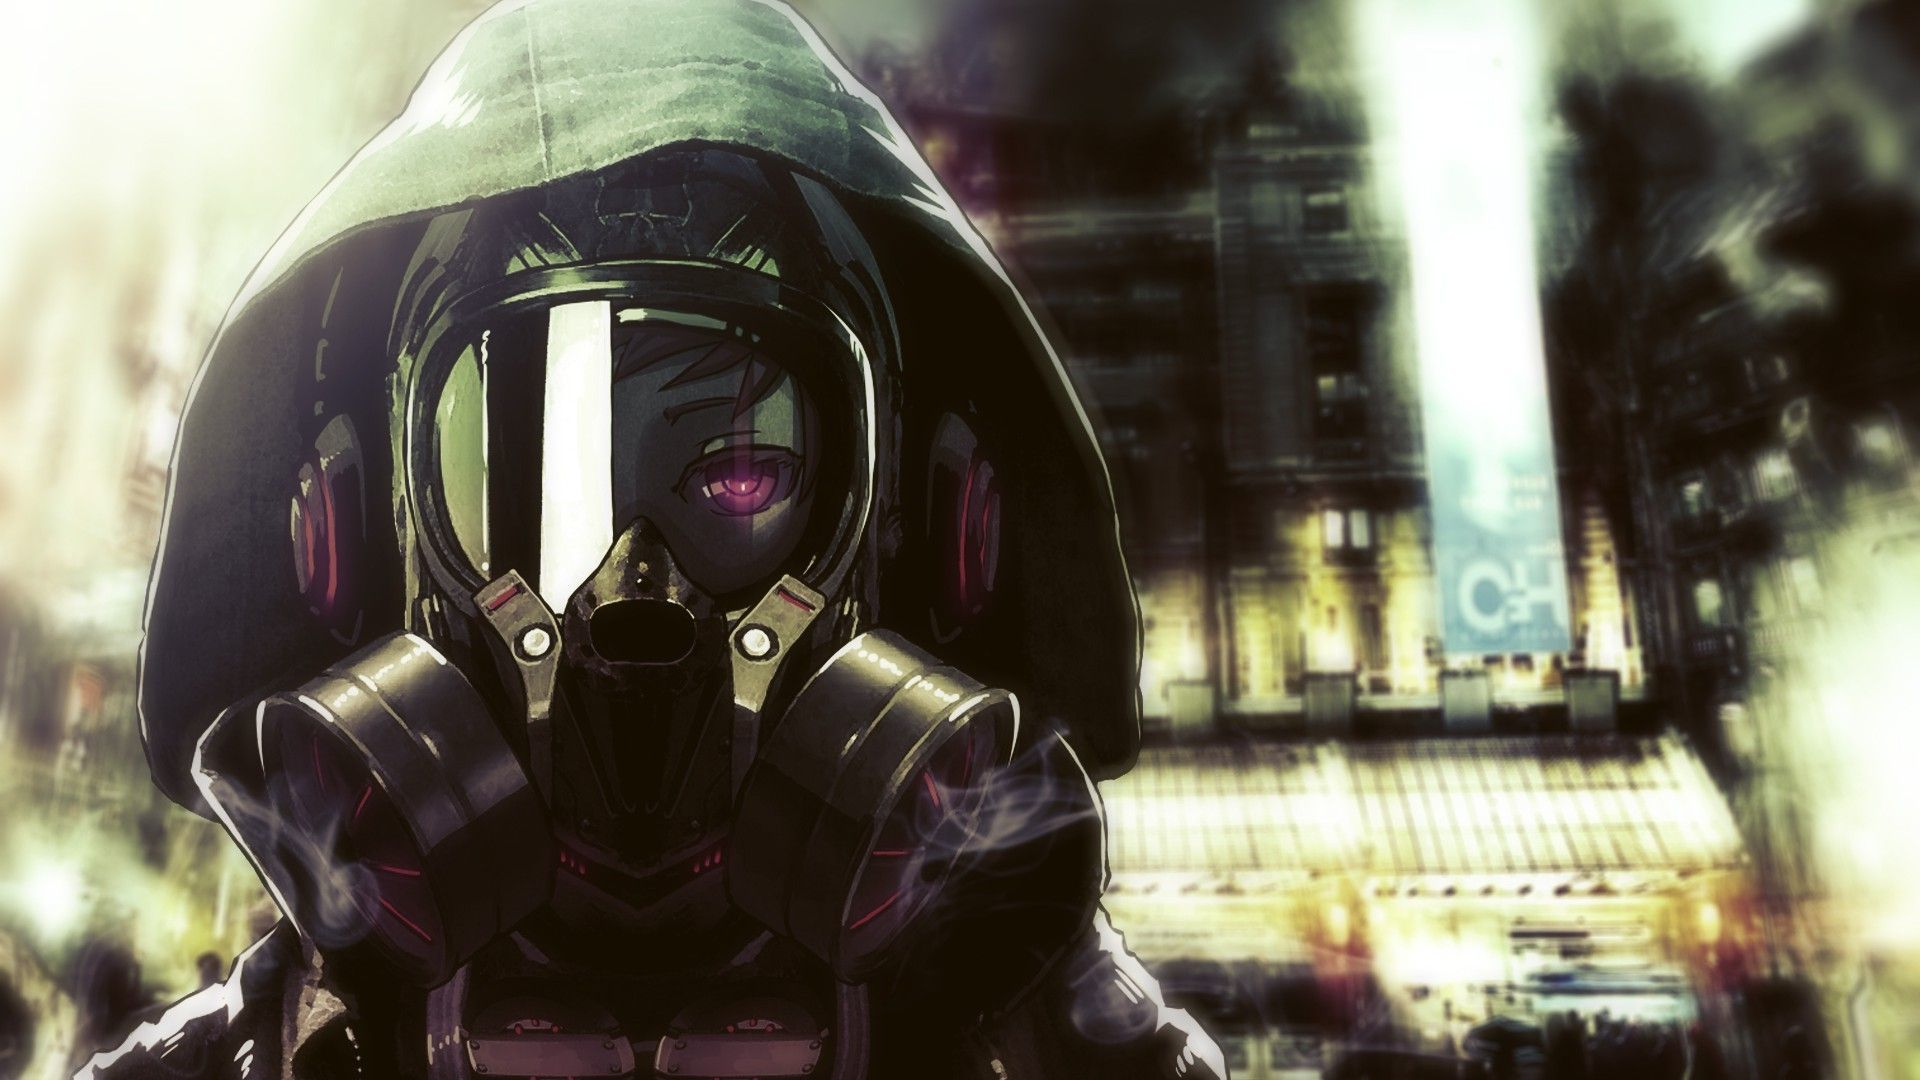 46 Anime Gas Mask Wallpaper On Wallpapersafari